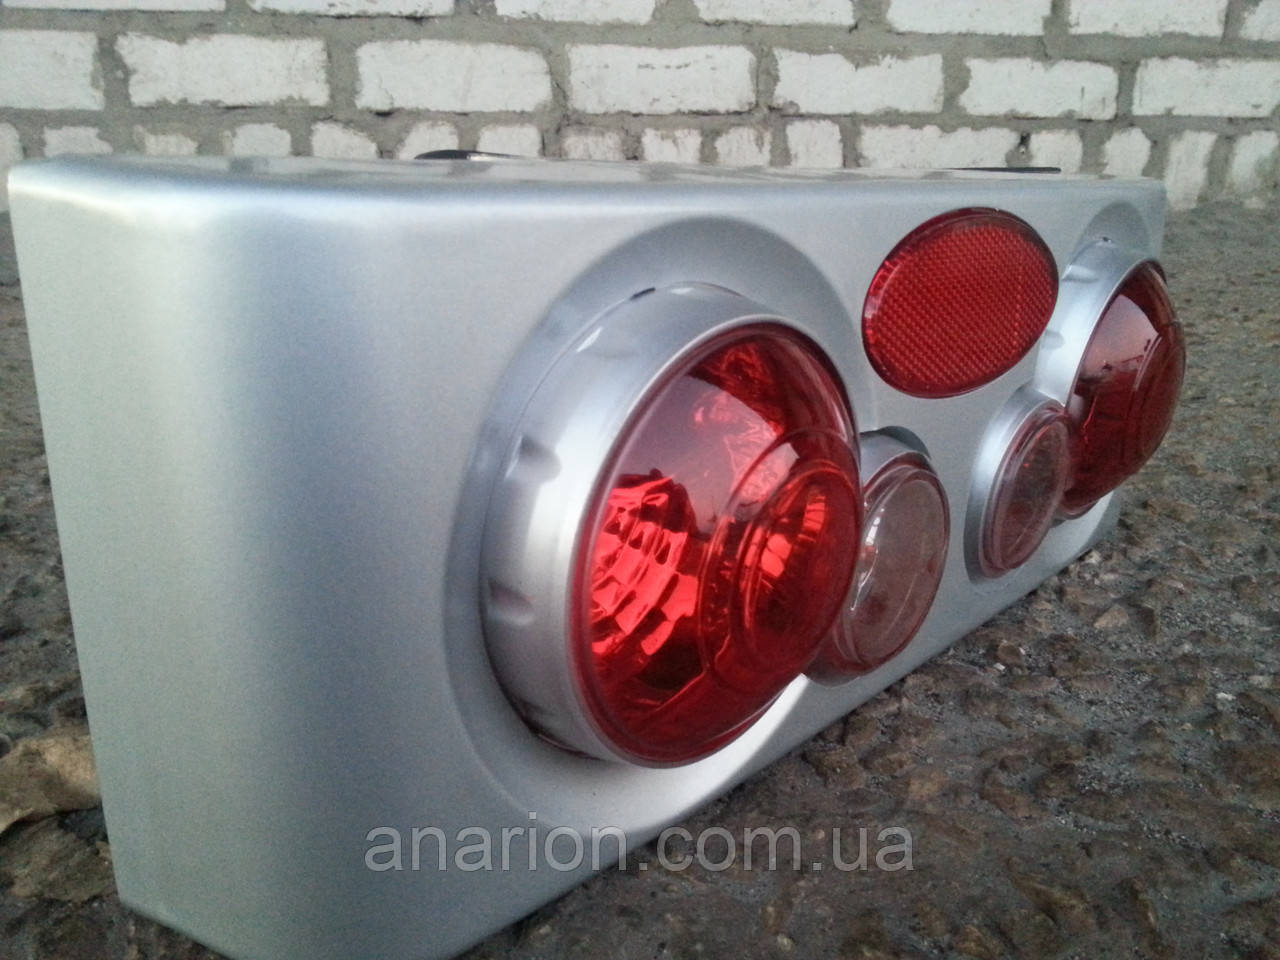 Задние стопы на ВАЗ 21099 корпус серый,3D